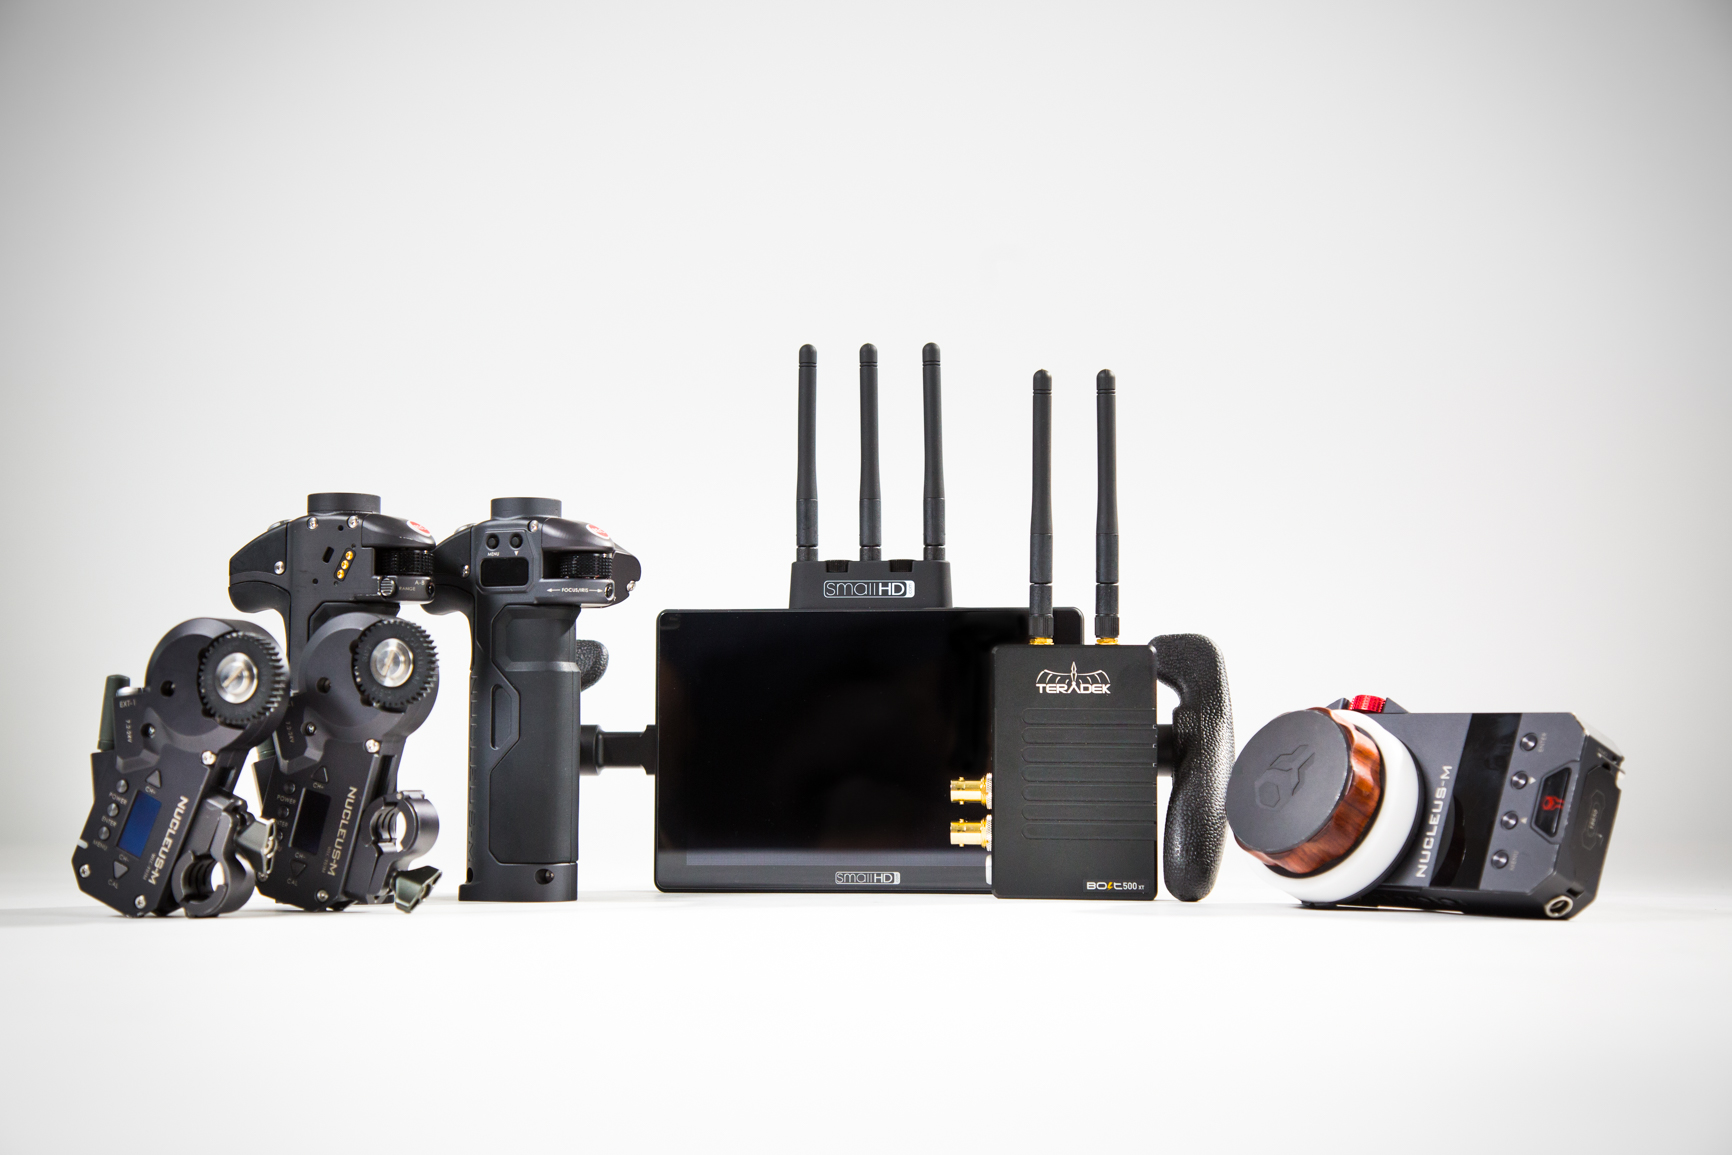 Tilta Nucleus M, SmallHD Cine 7 & Teradek 500 Transmitter Kit